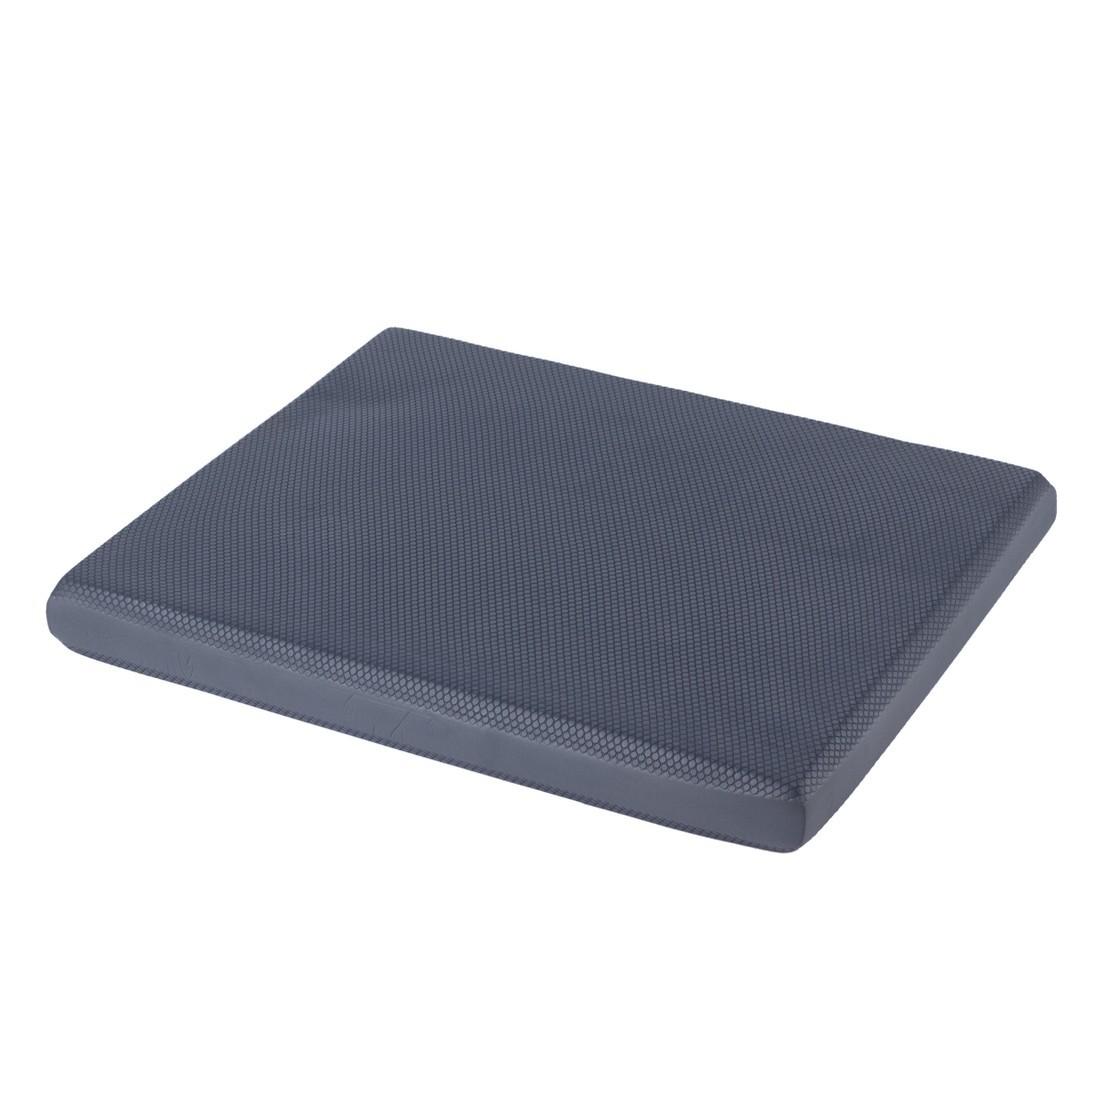 spirit balance block coussin d quilibre xxl matelas d exercice yoga fitness 50 x 40 x 6 cm. Black Bedroom Furniture Sets. Home Design Ideas